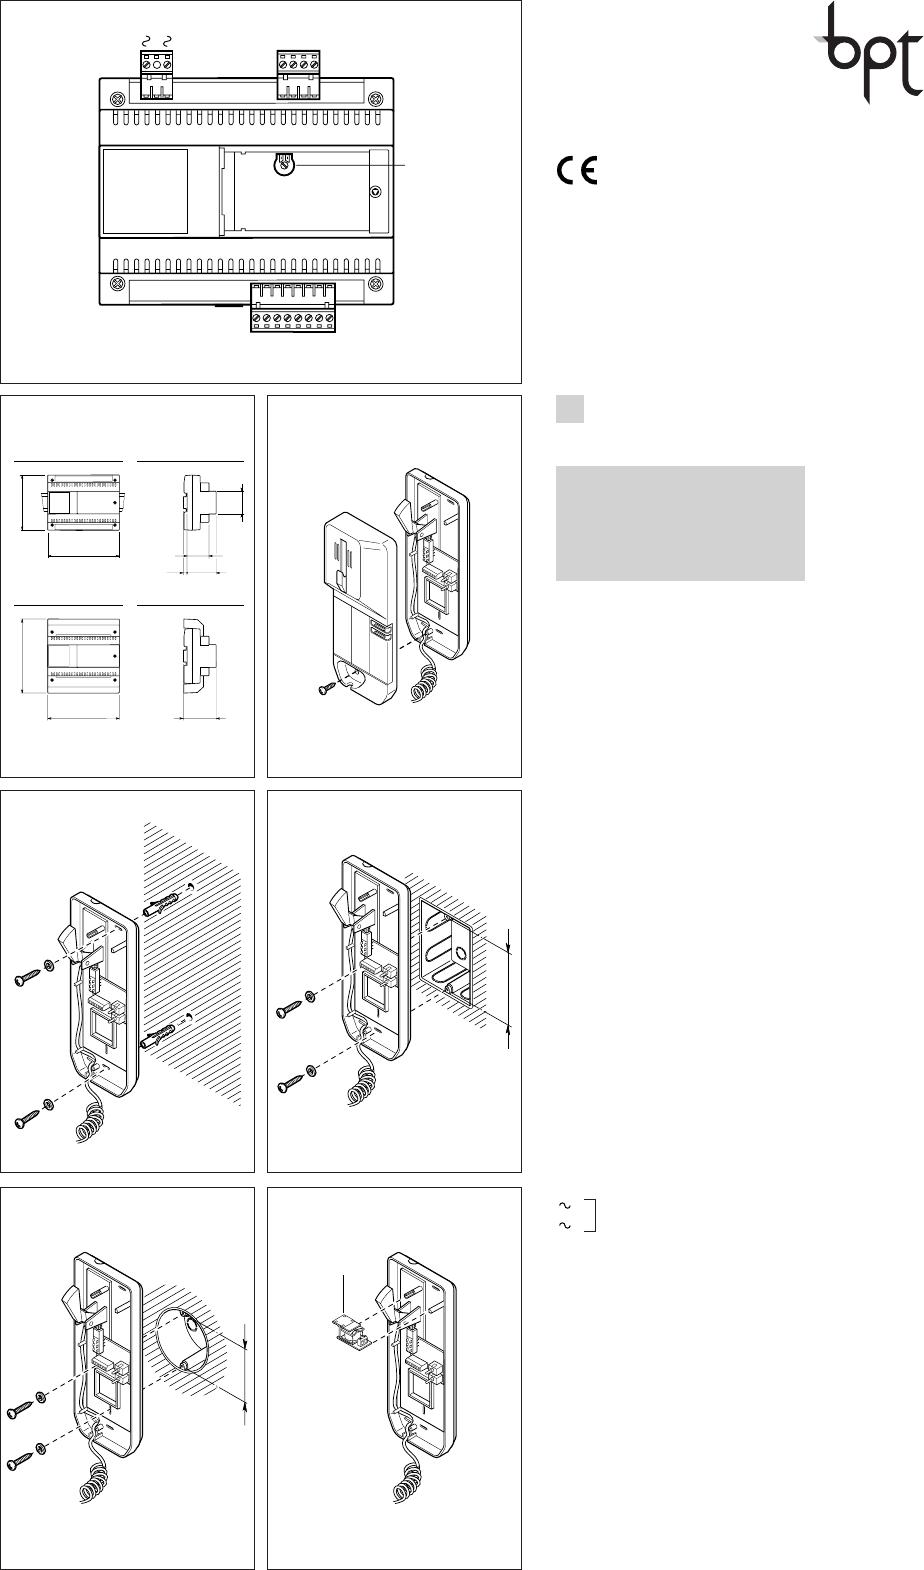 Bpt 305g